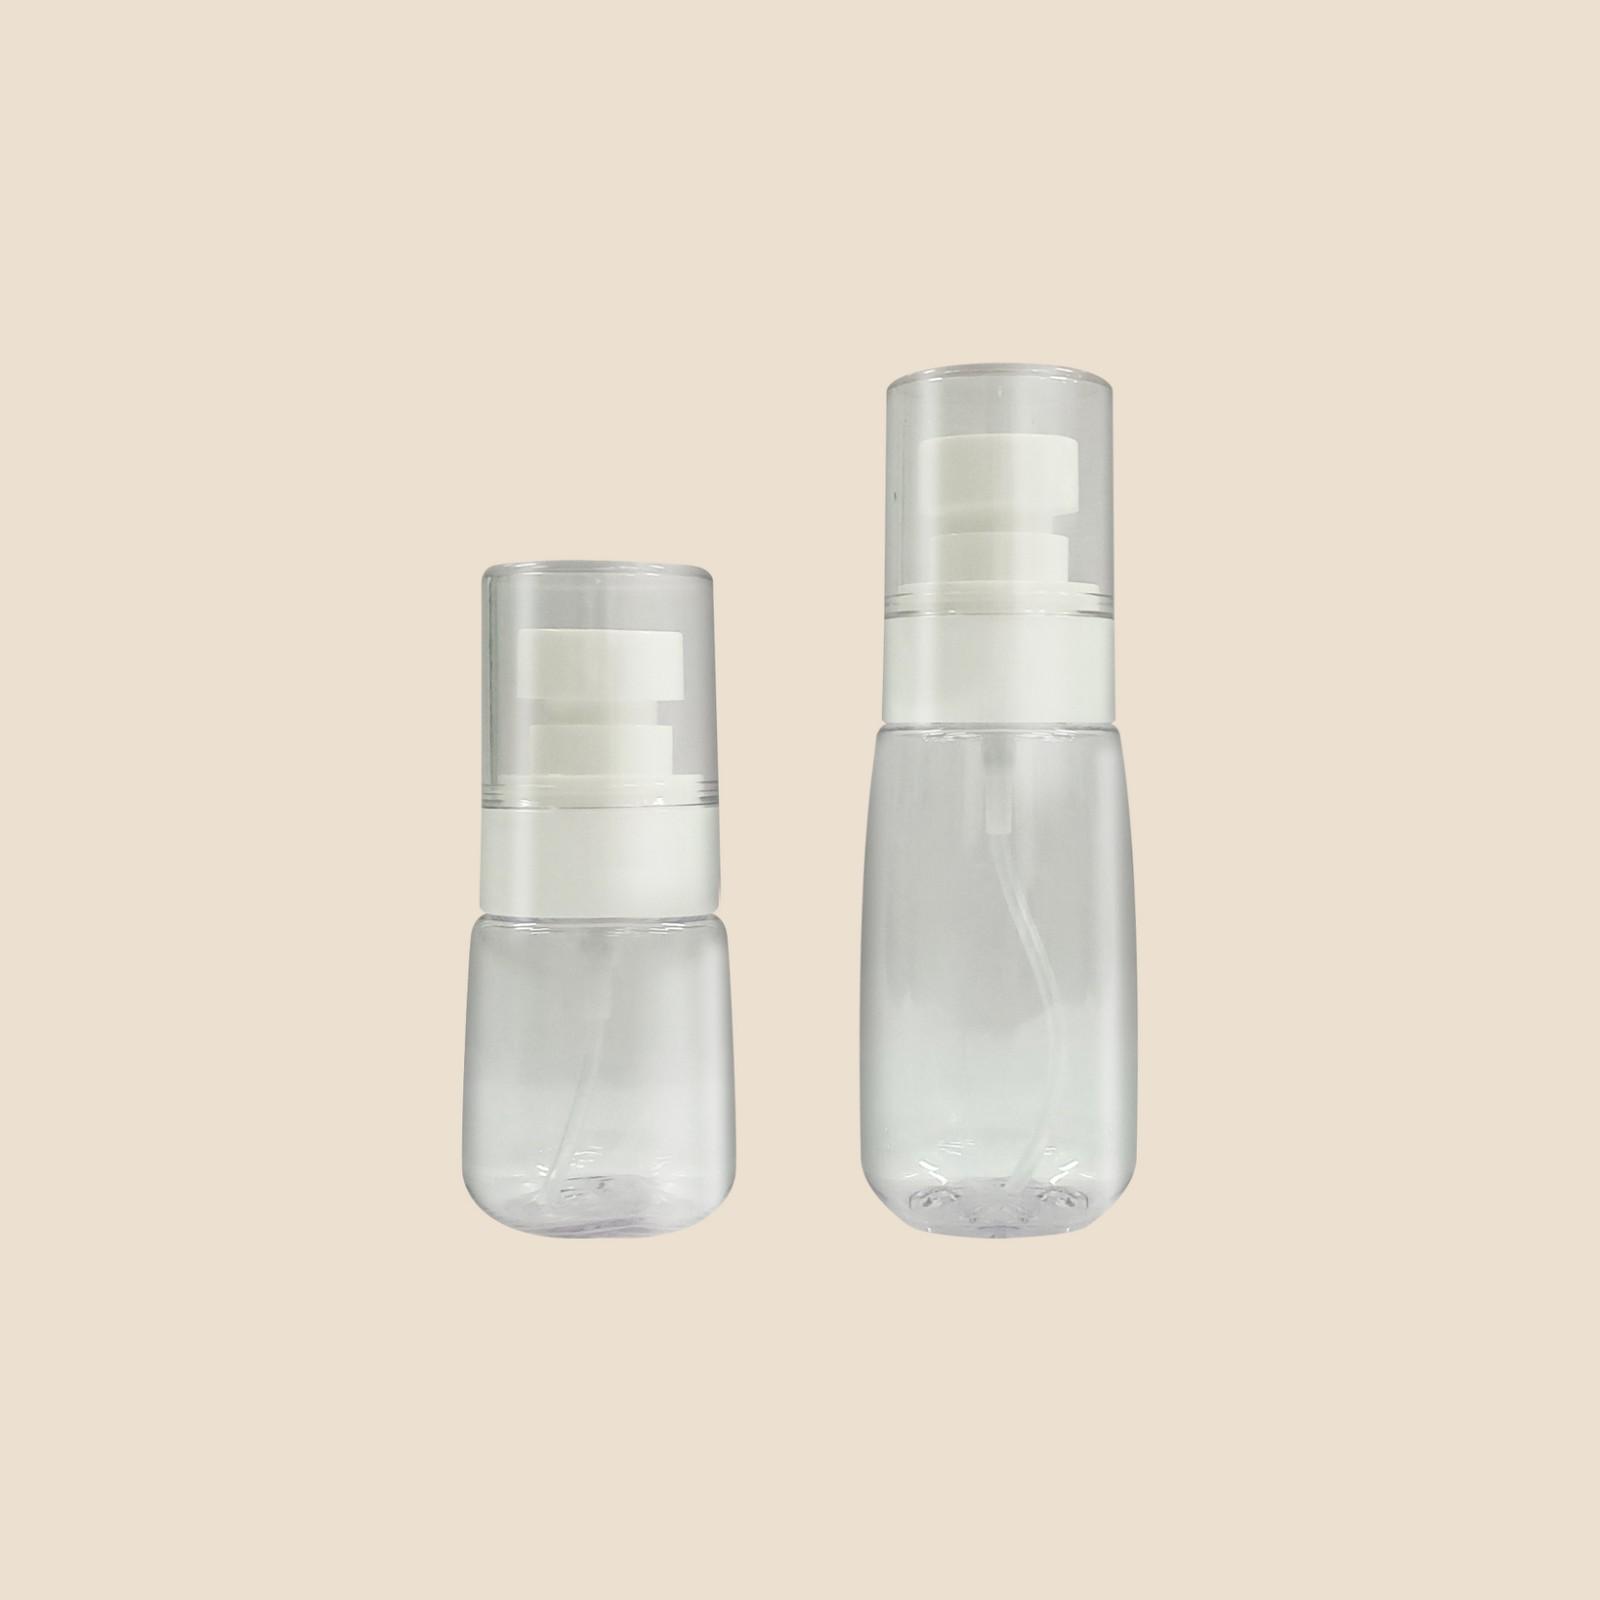 3 sizes Mist Sprayer Bottle